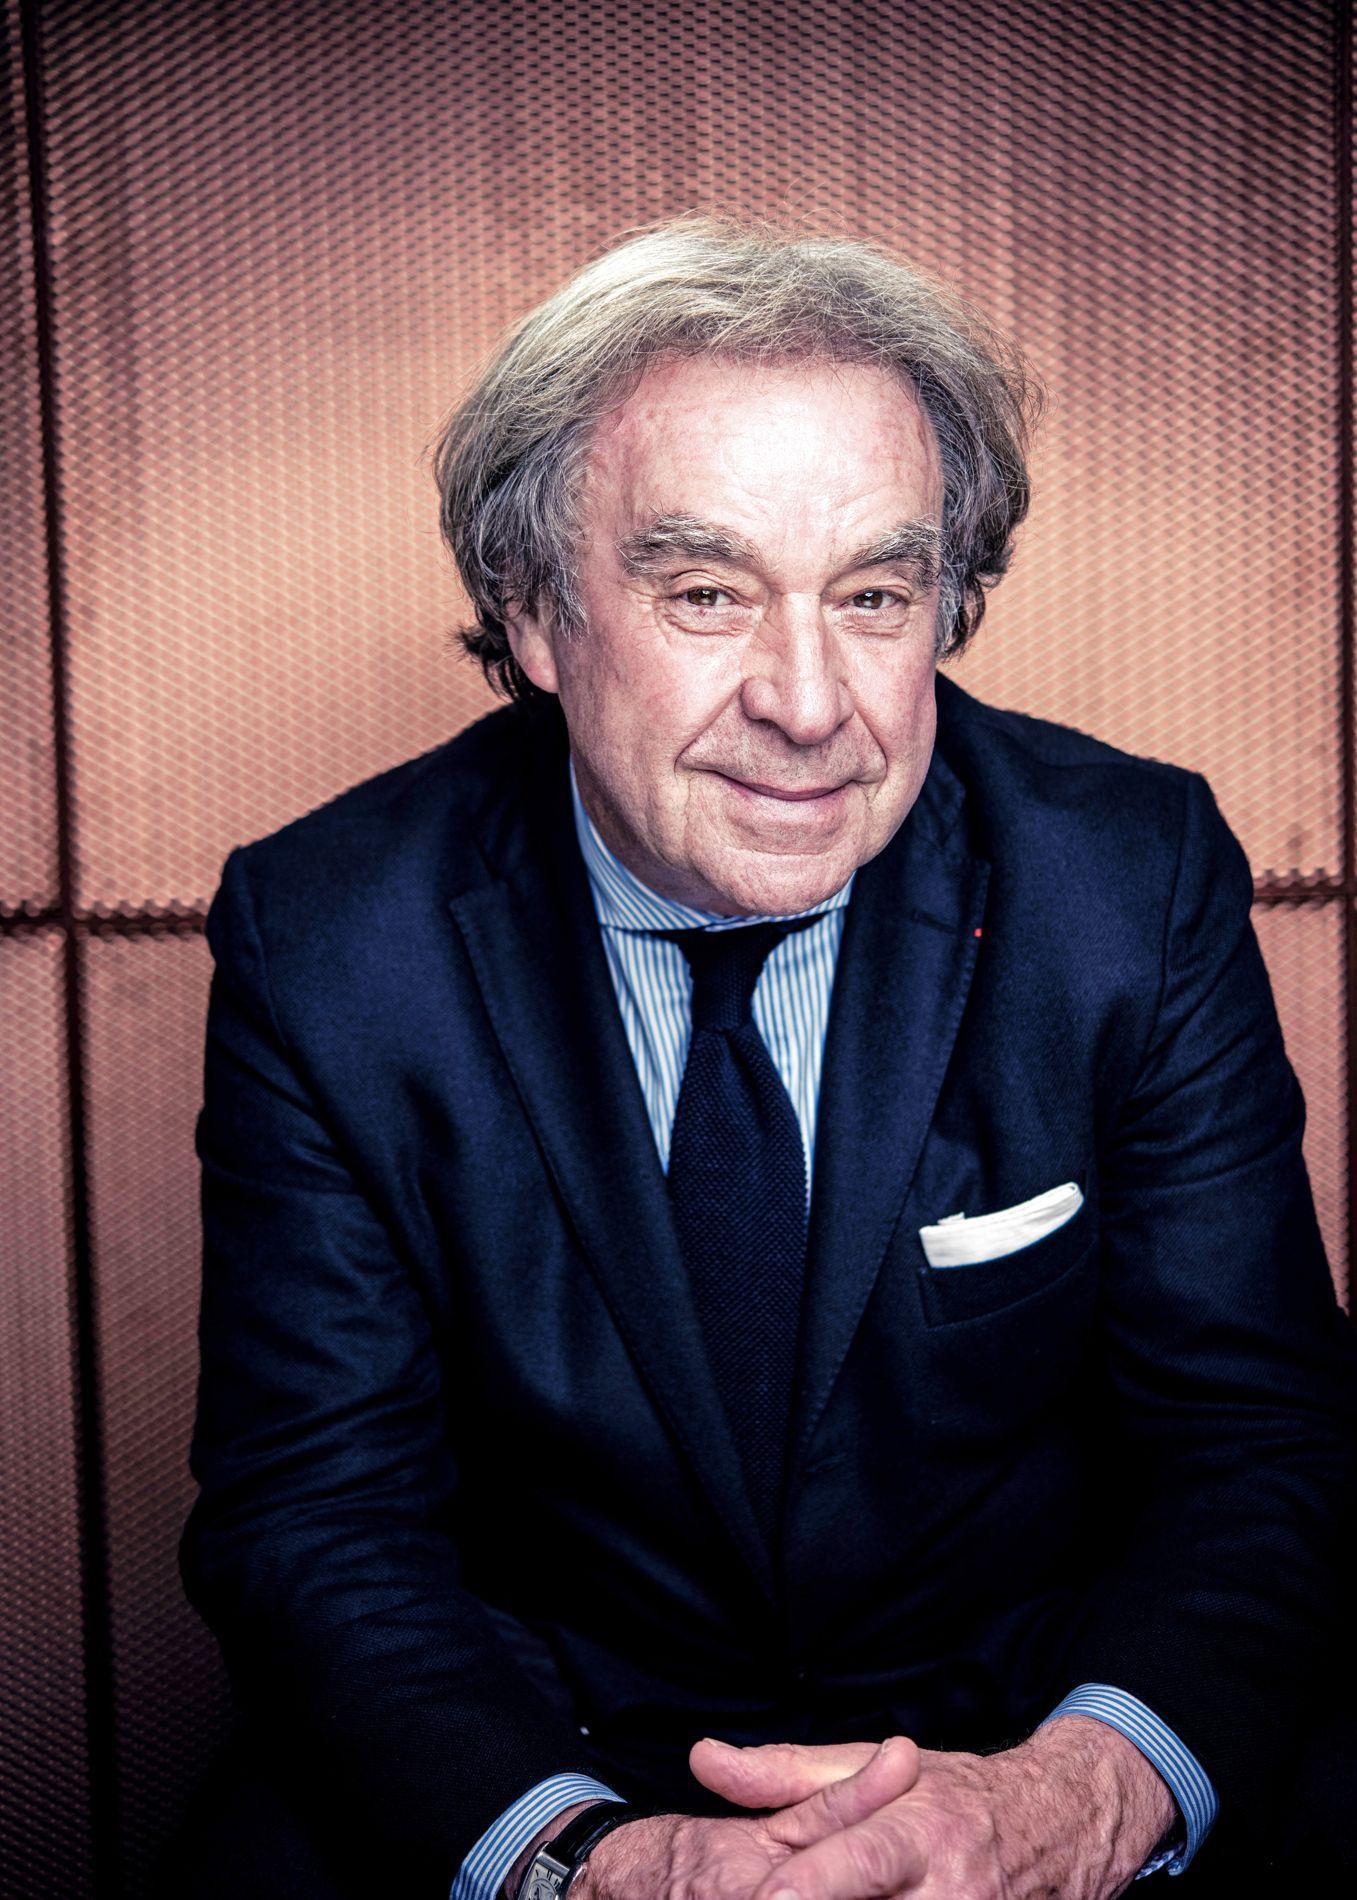 Jean-Michel Wilmotte Net Worth